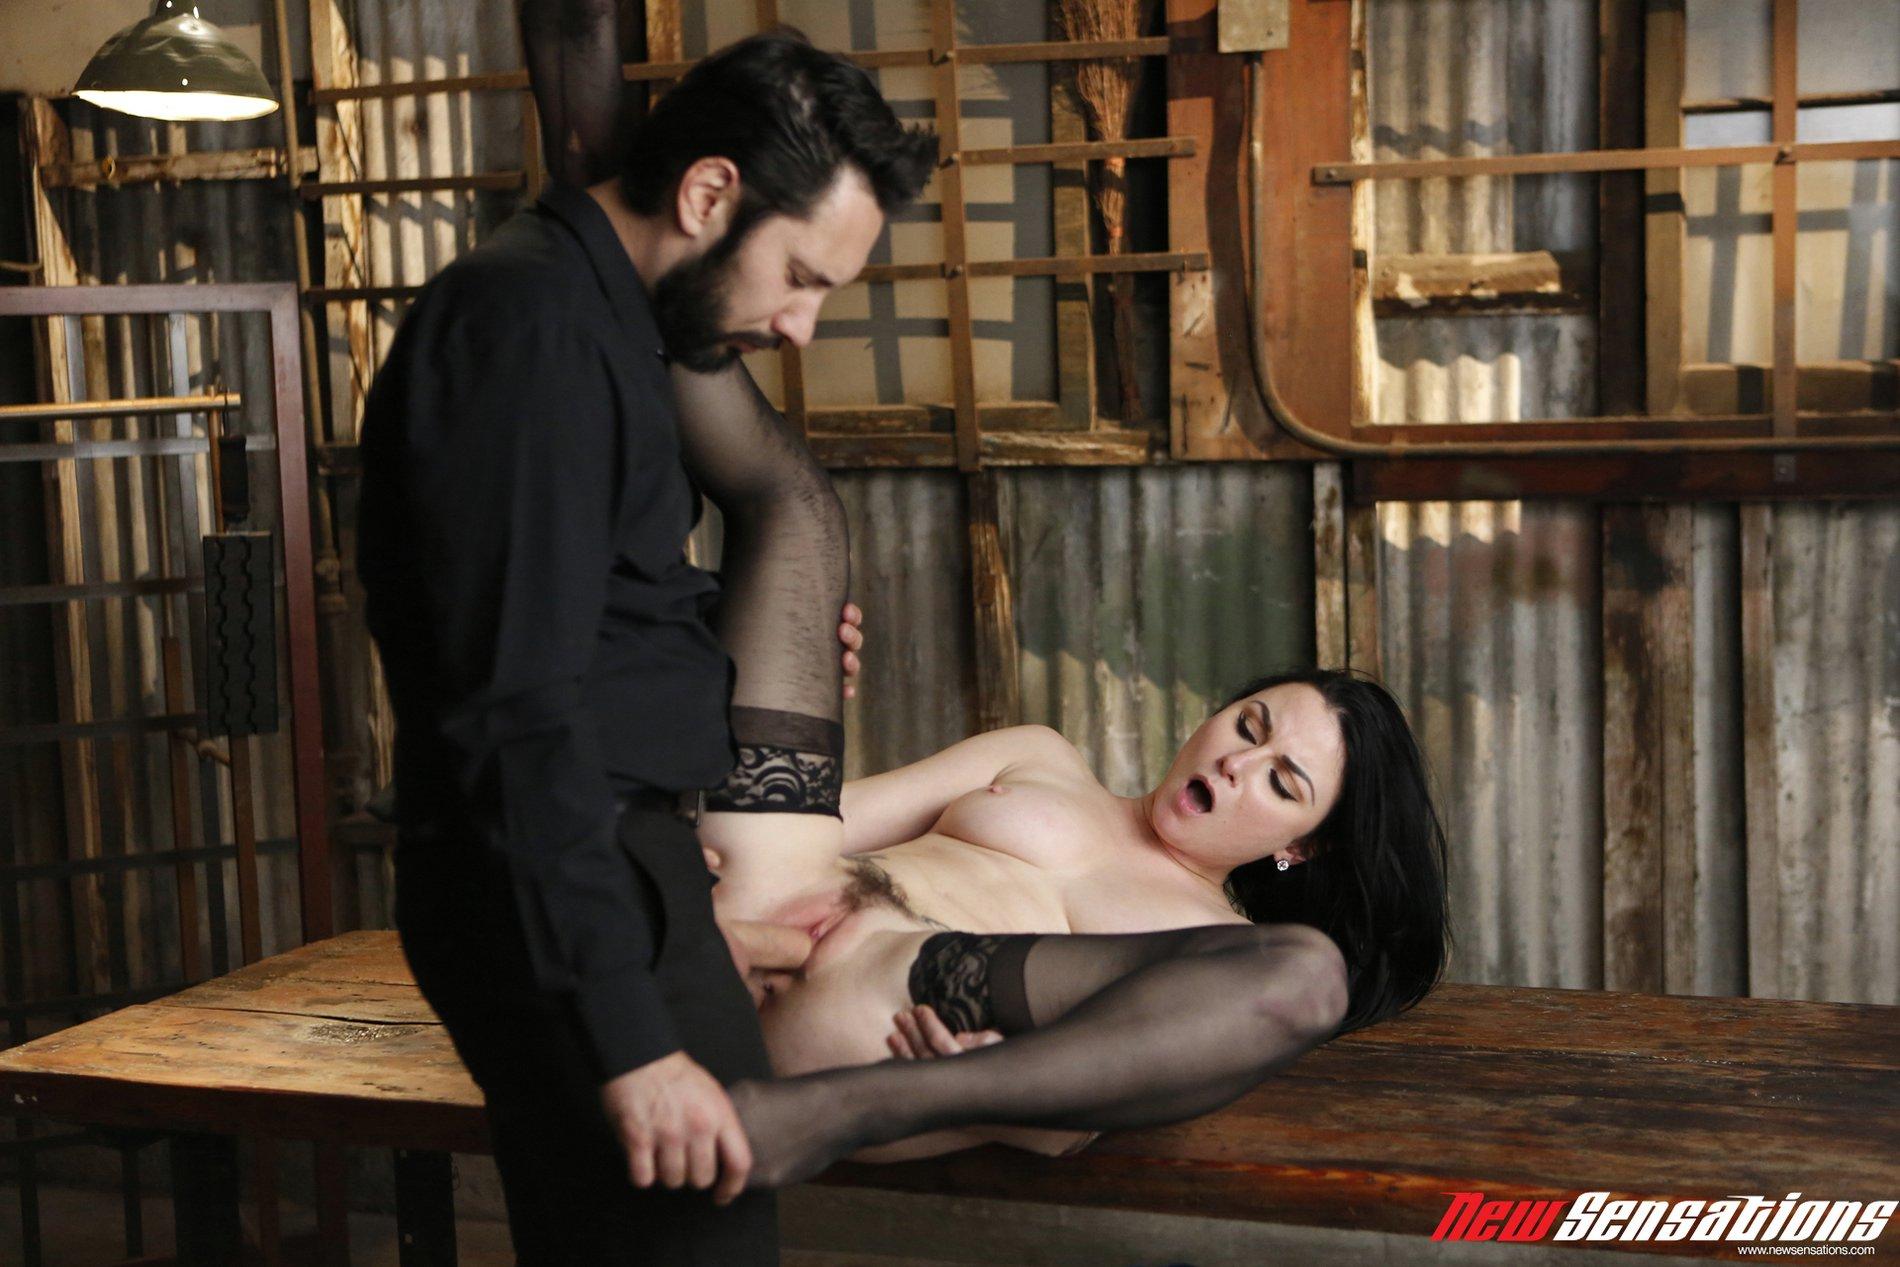 Tied up veruca james enjoys hardcore pleasures 7